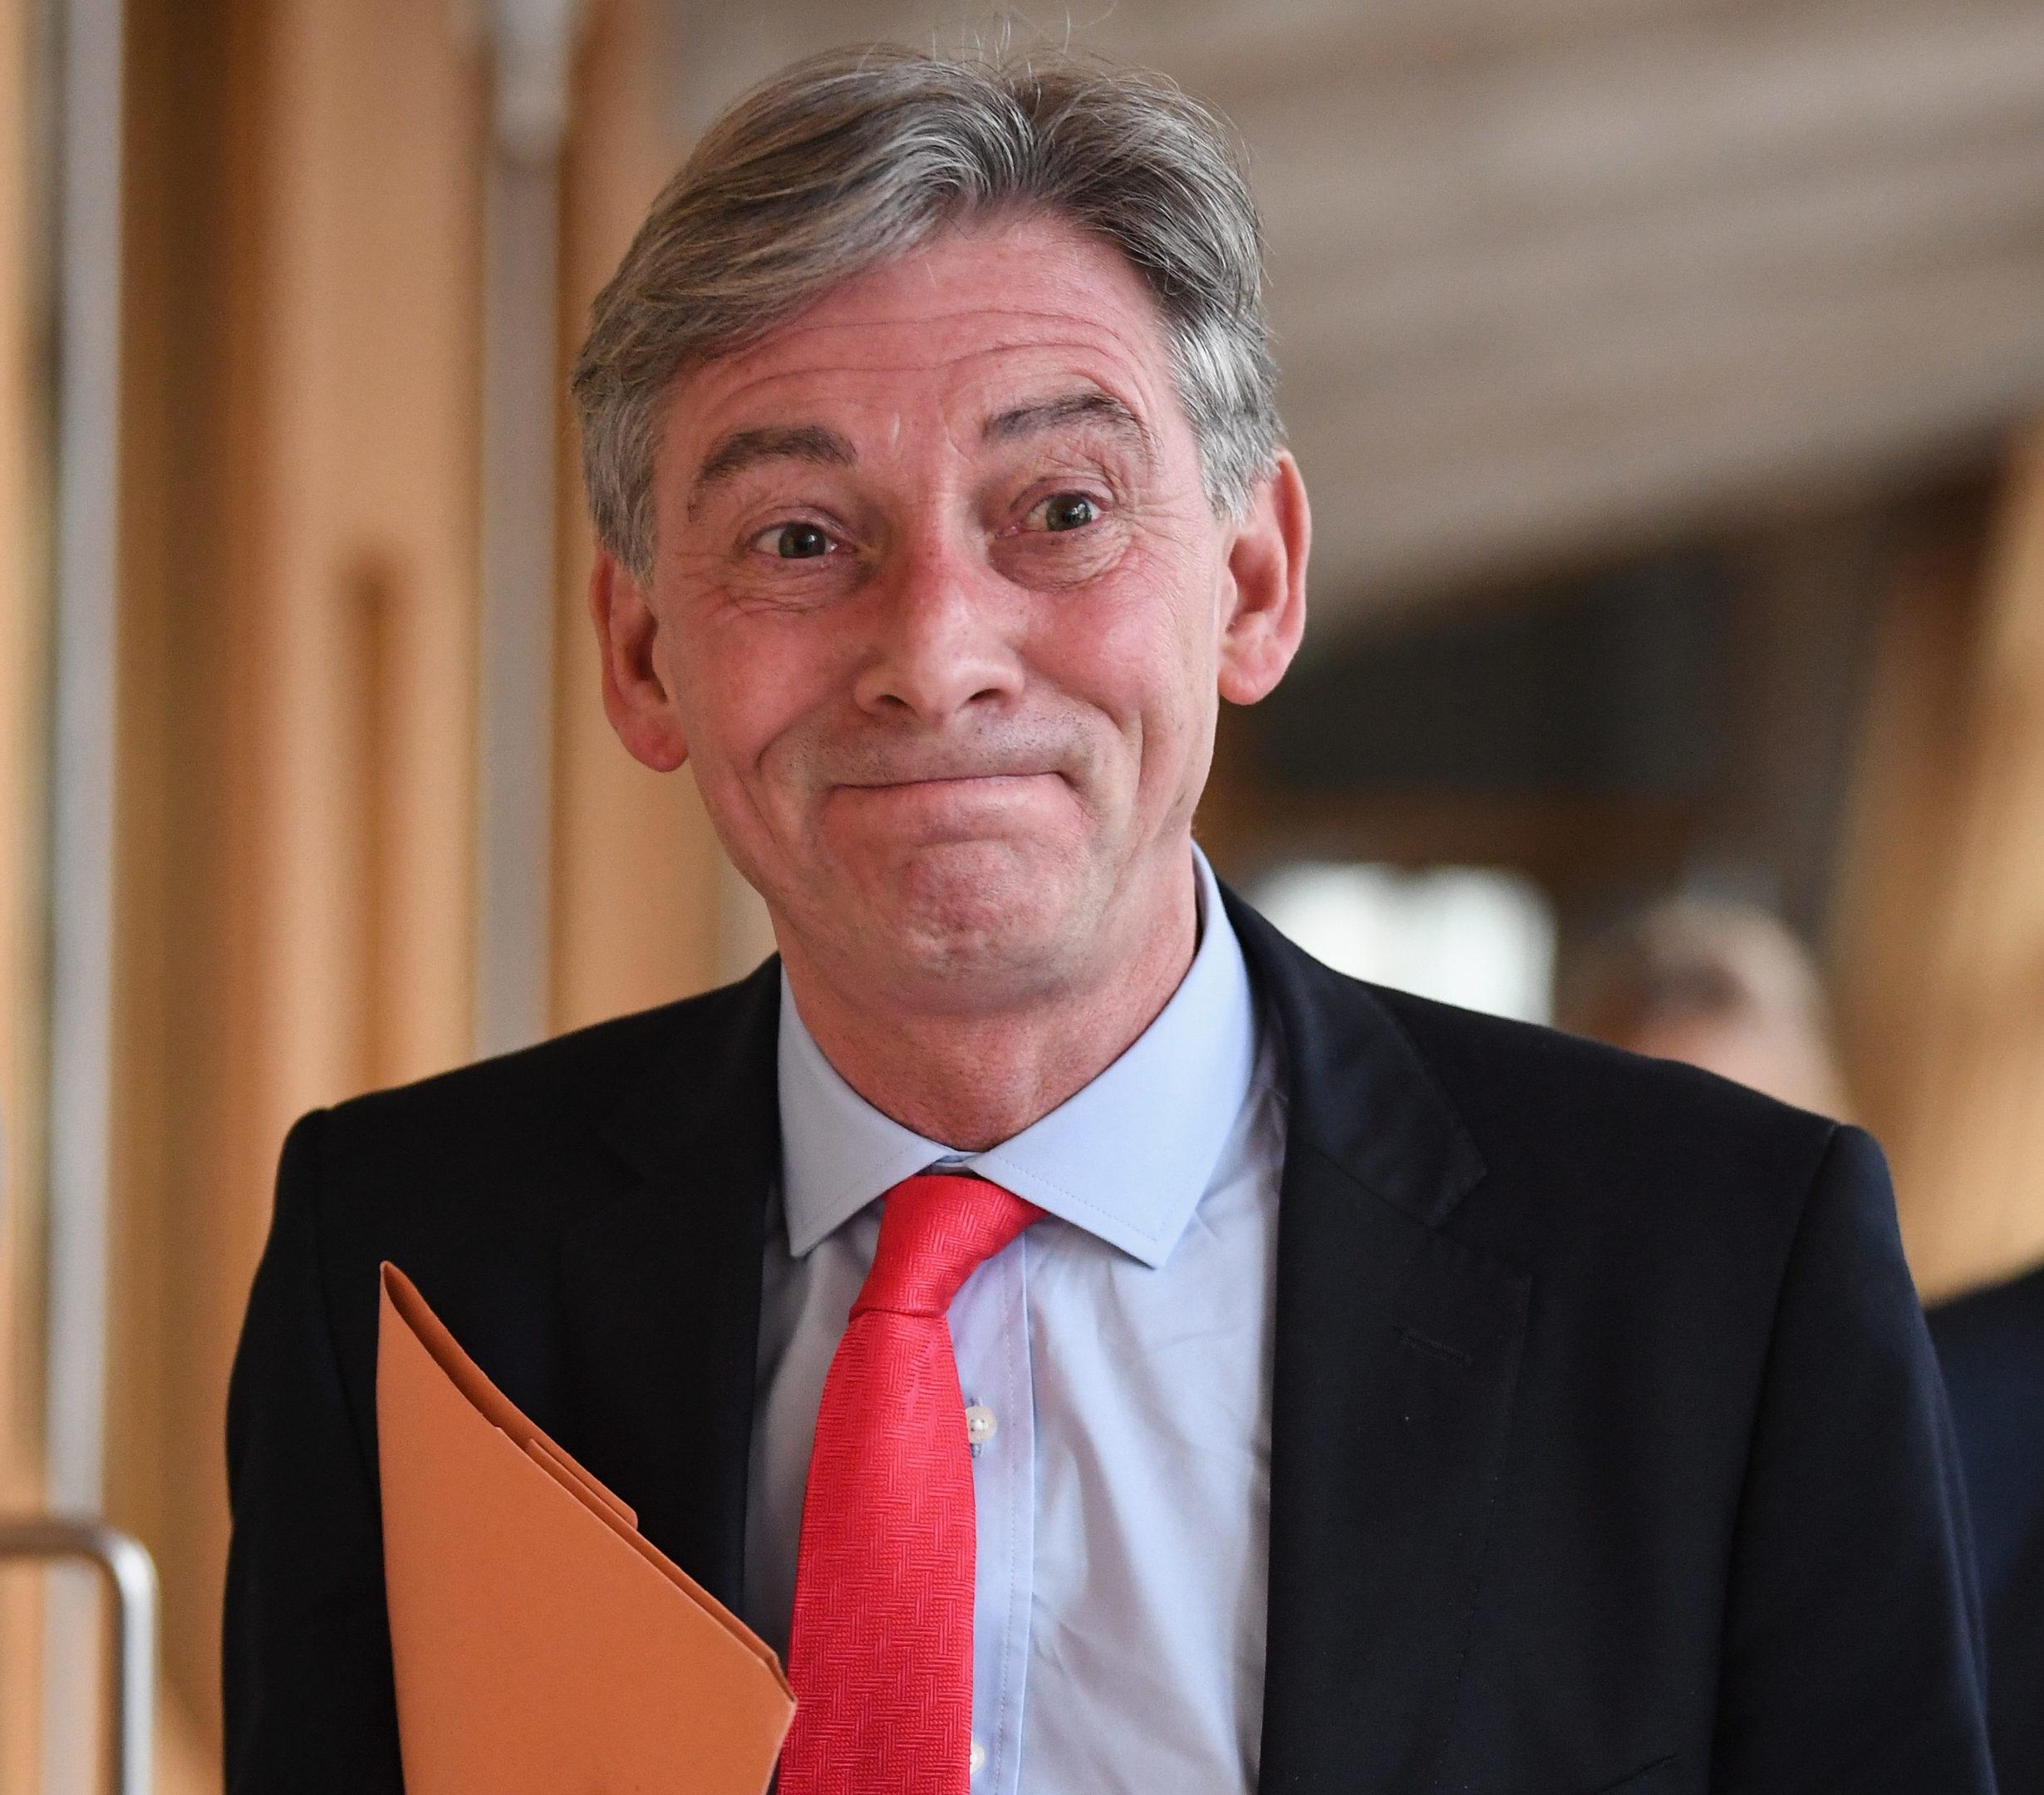 Scottish Labour party leader Richard Leonard (Jeff J Mitchell/Getty Images)